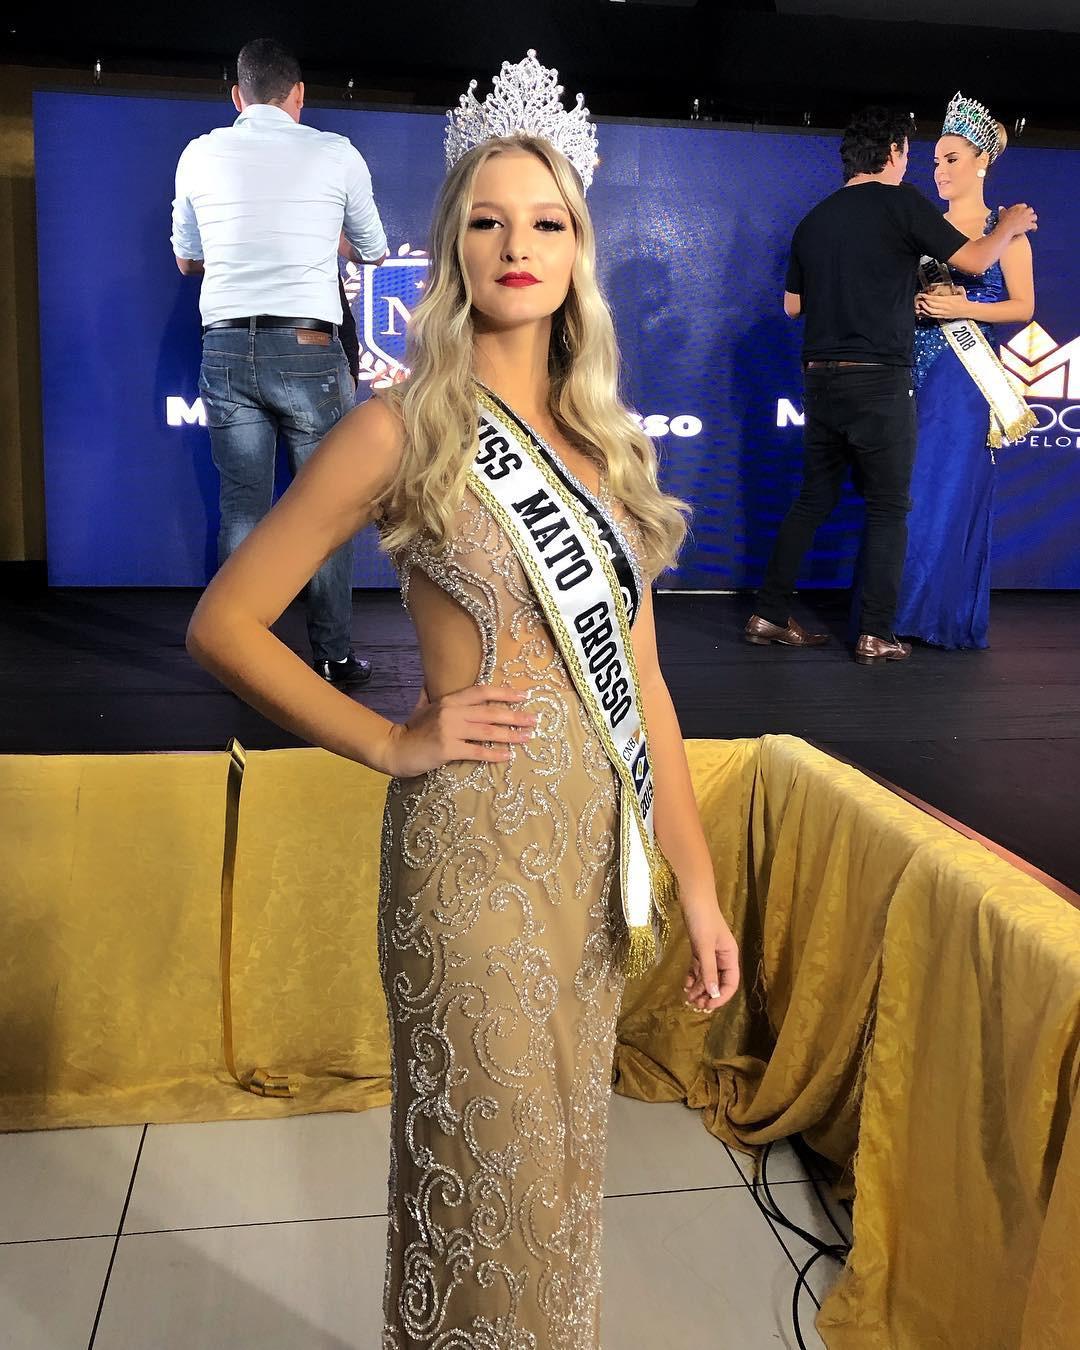 larissa neiverth, top 20 de miss brasil mundo 2019. - Página 5 Qgmg6l10